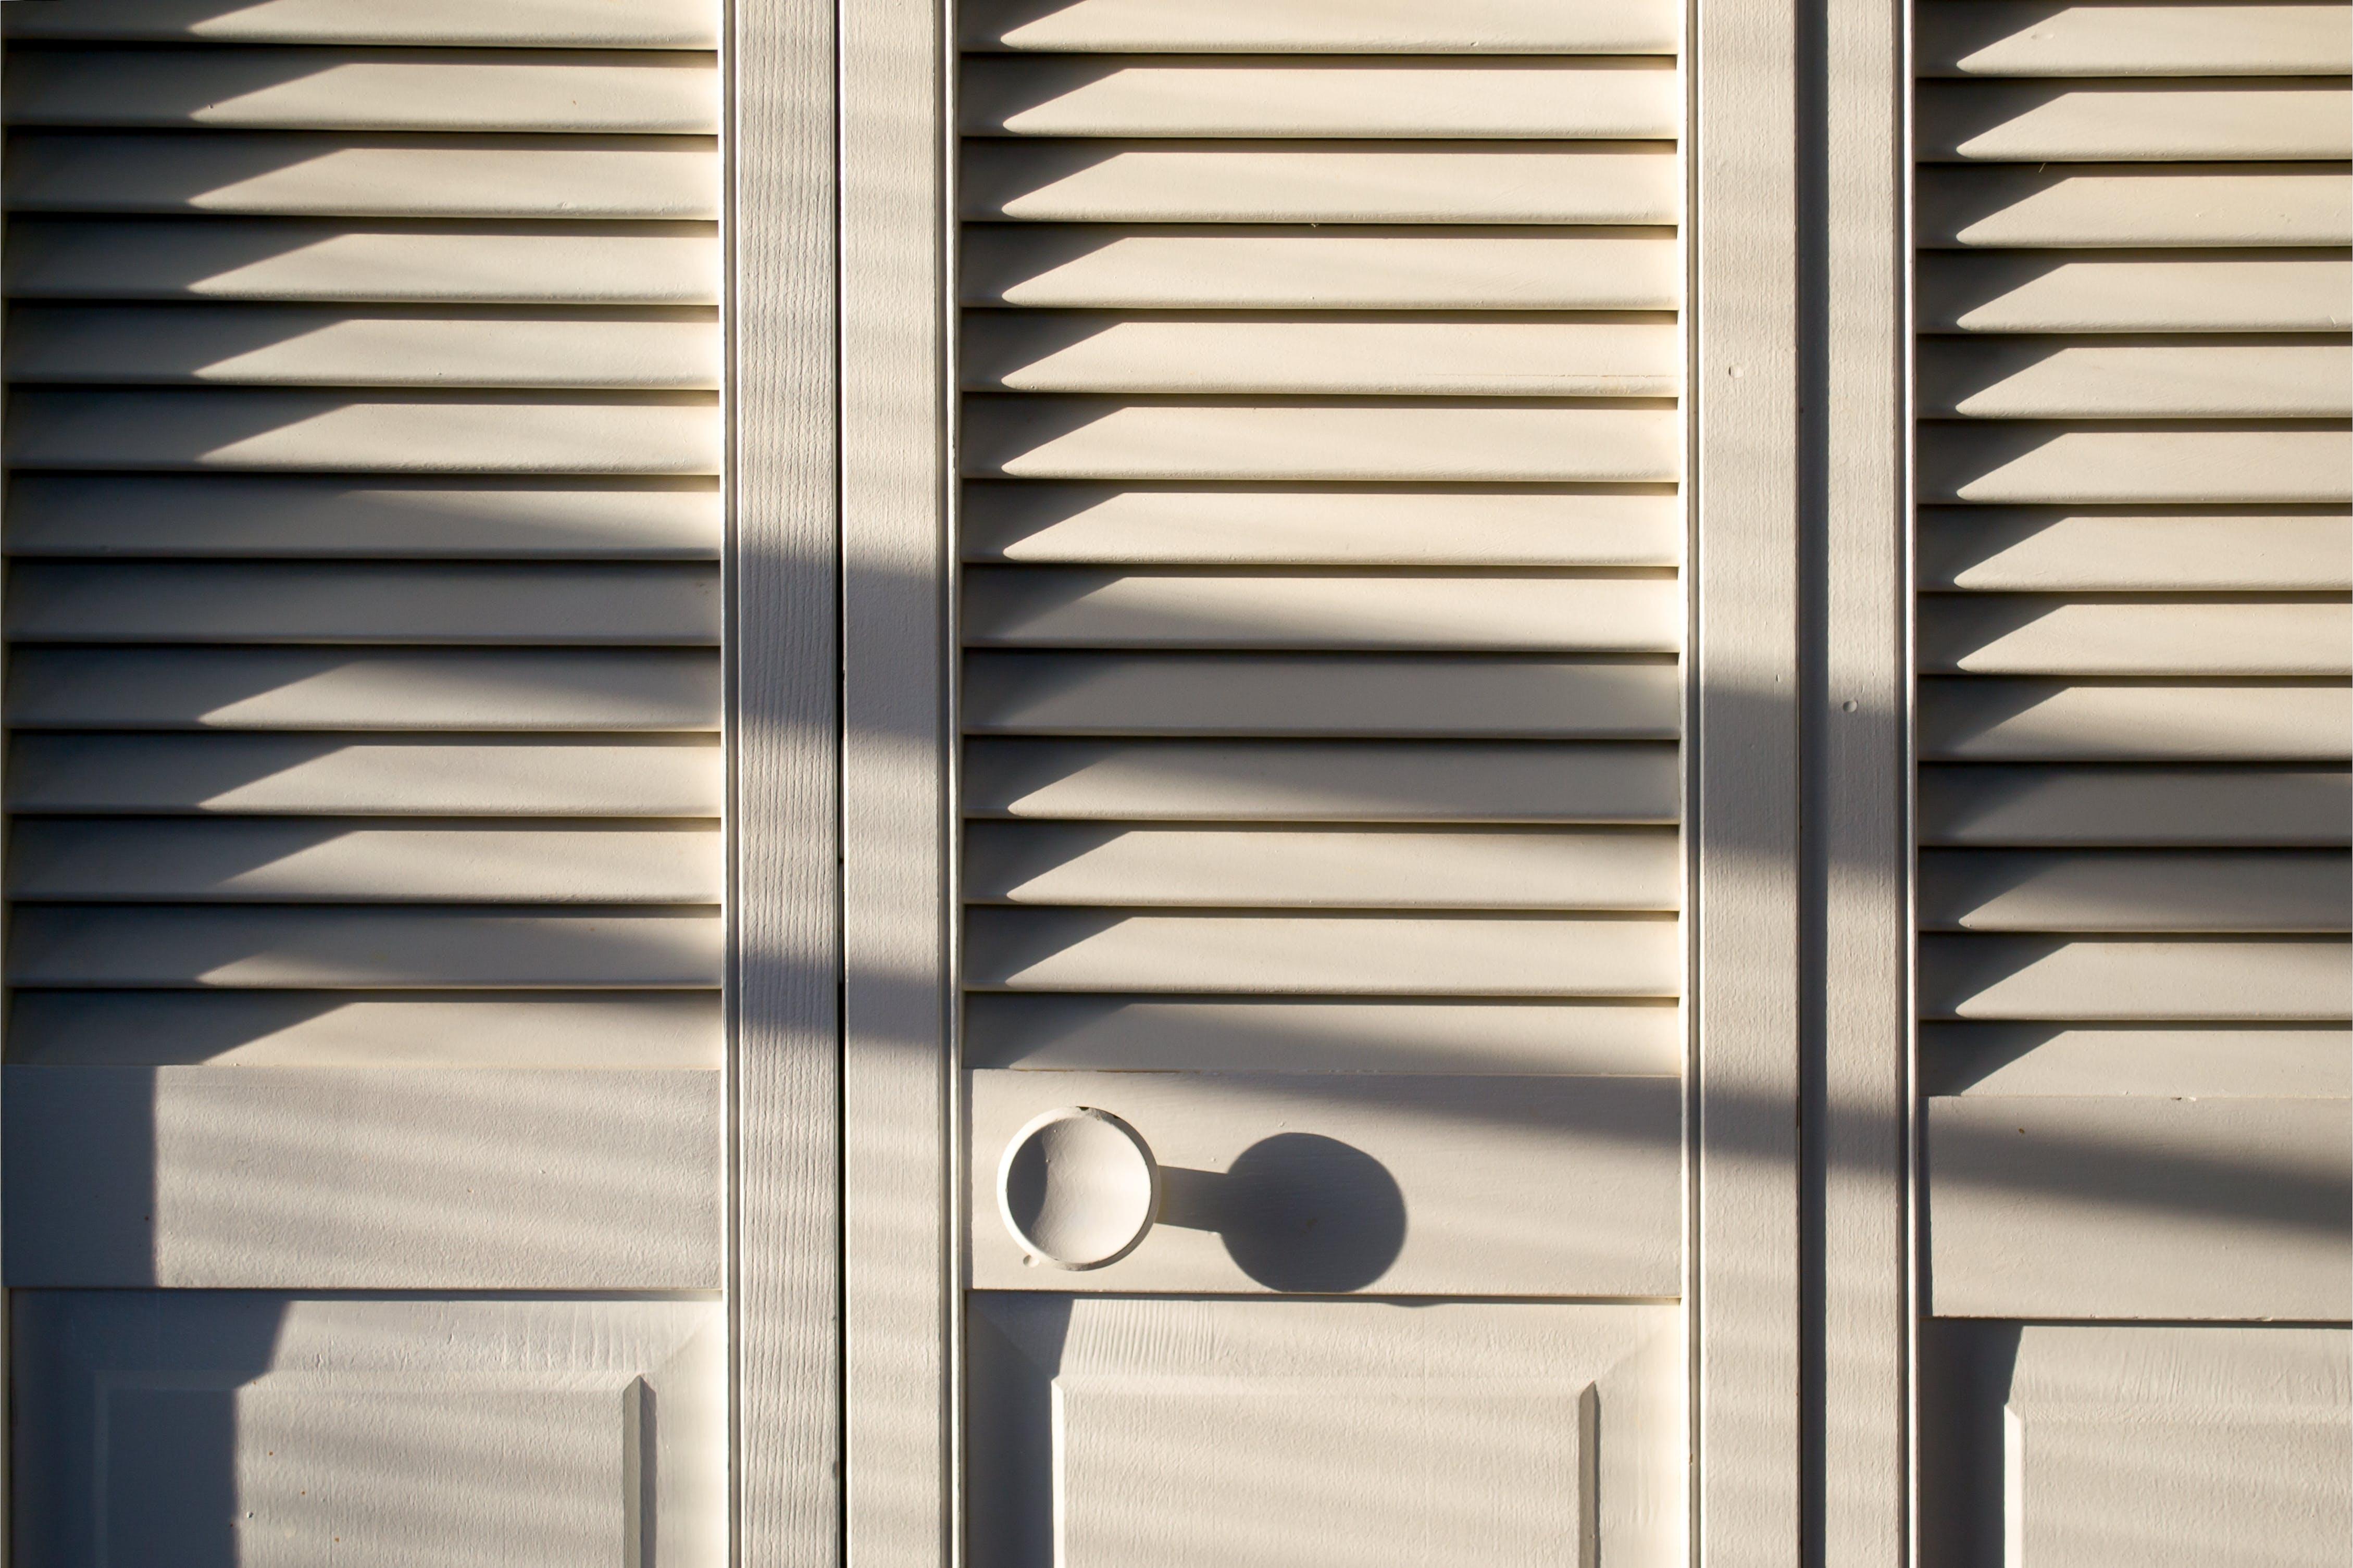 Free stock photo of abstract, shadows, minimalist, minimalism